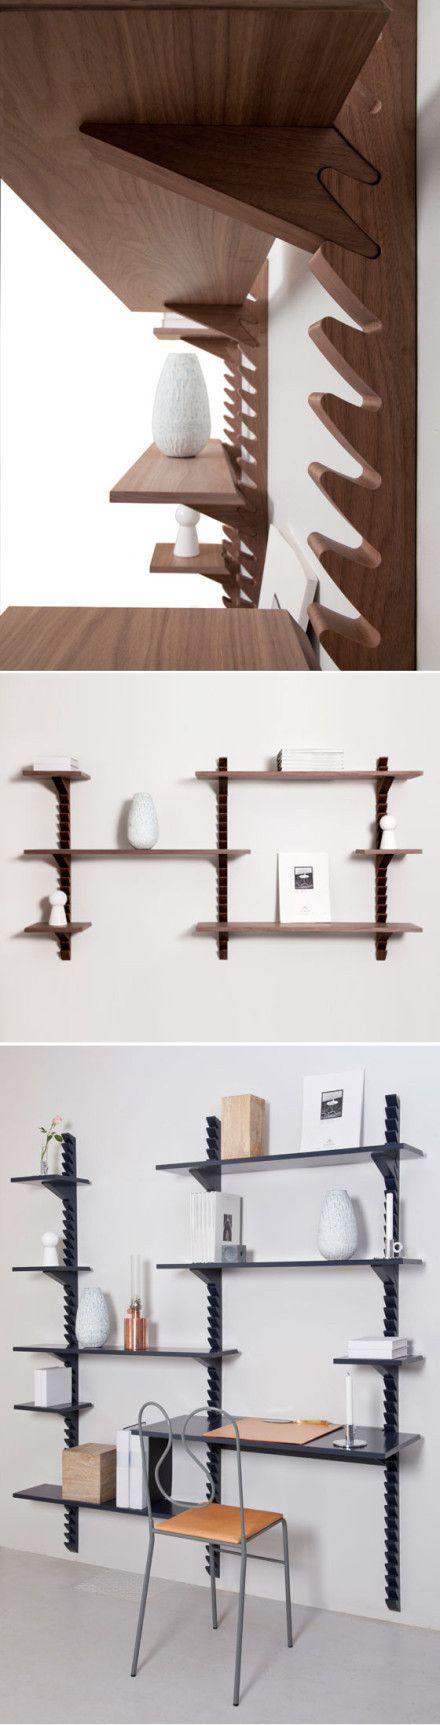 25 best ideas about adjustable shelving on pinterest cnc traditional kitchen measuring tools. Black Bedroom Furniture Sets. Home Design Ideas